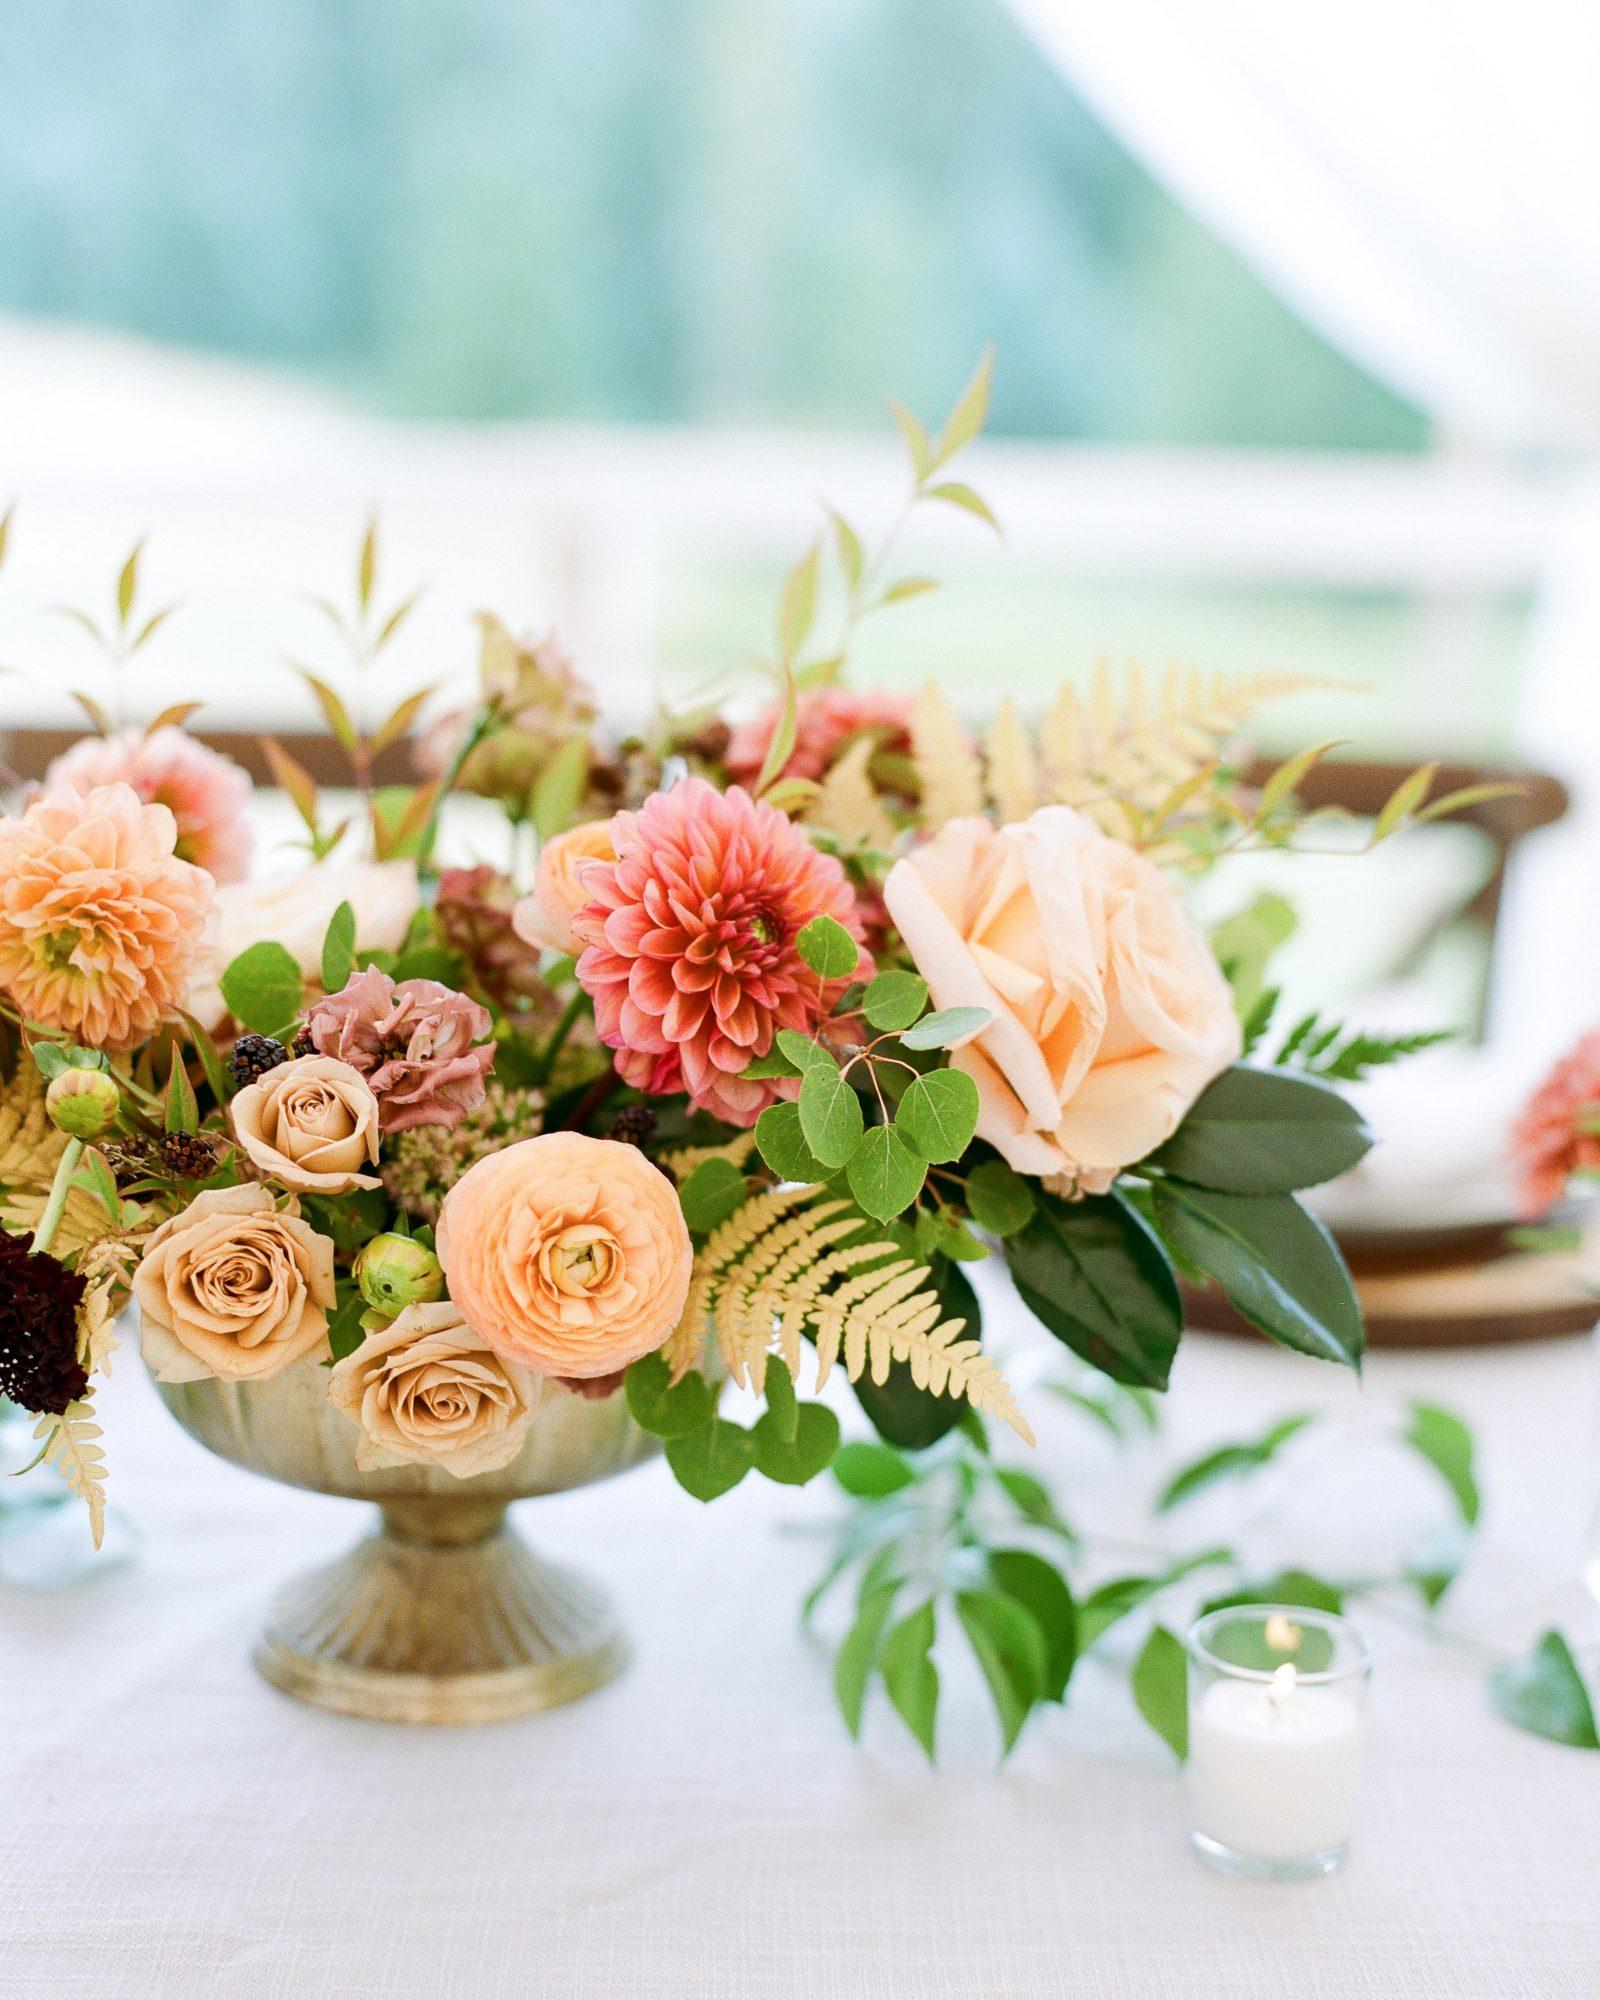 jill phil wedding floral centerpiece in gold vase